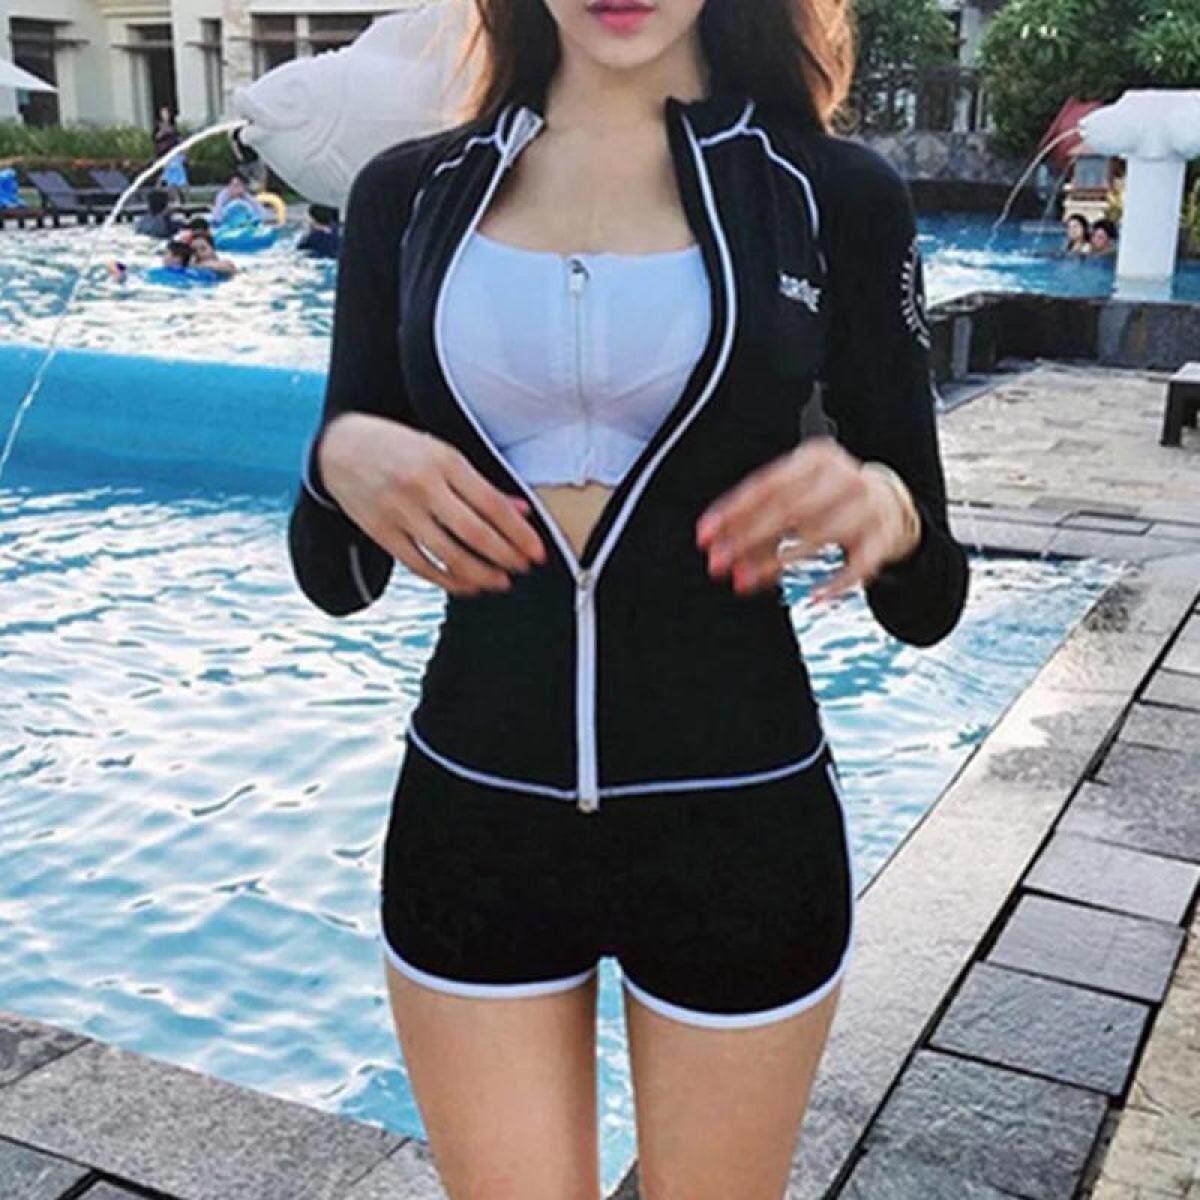 1808d47d93 (Tops+Bra+Shorts) Women Rashguards Suit Long Sleeve Tops Swimming Suit Set